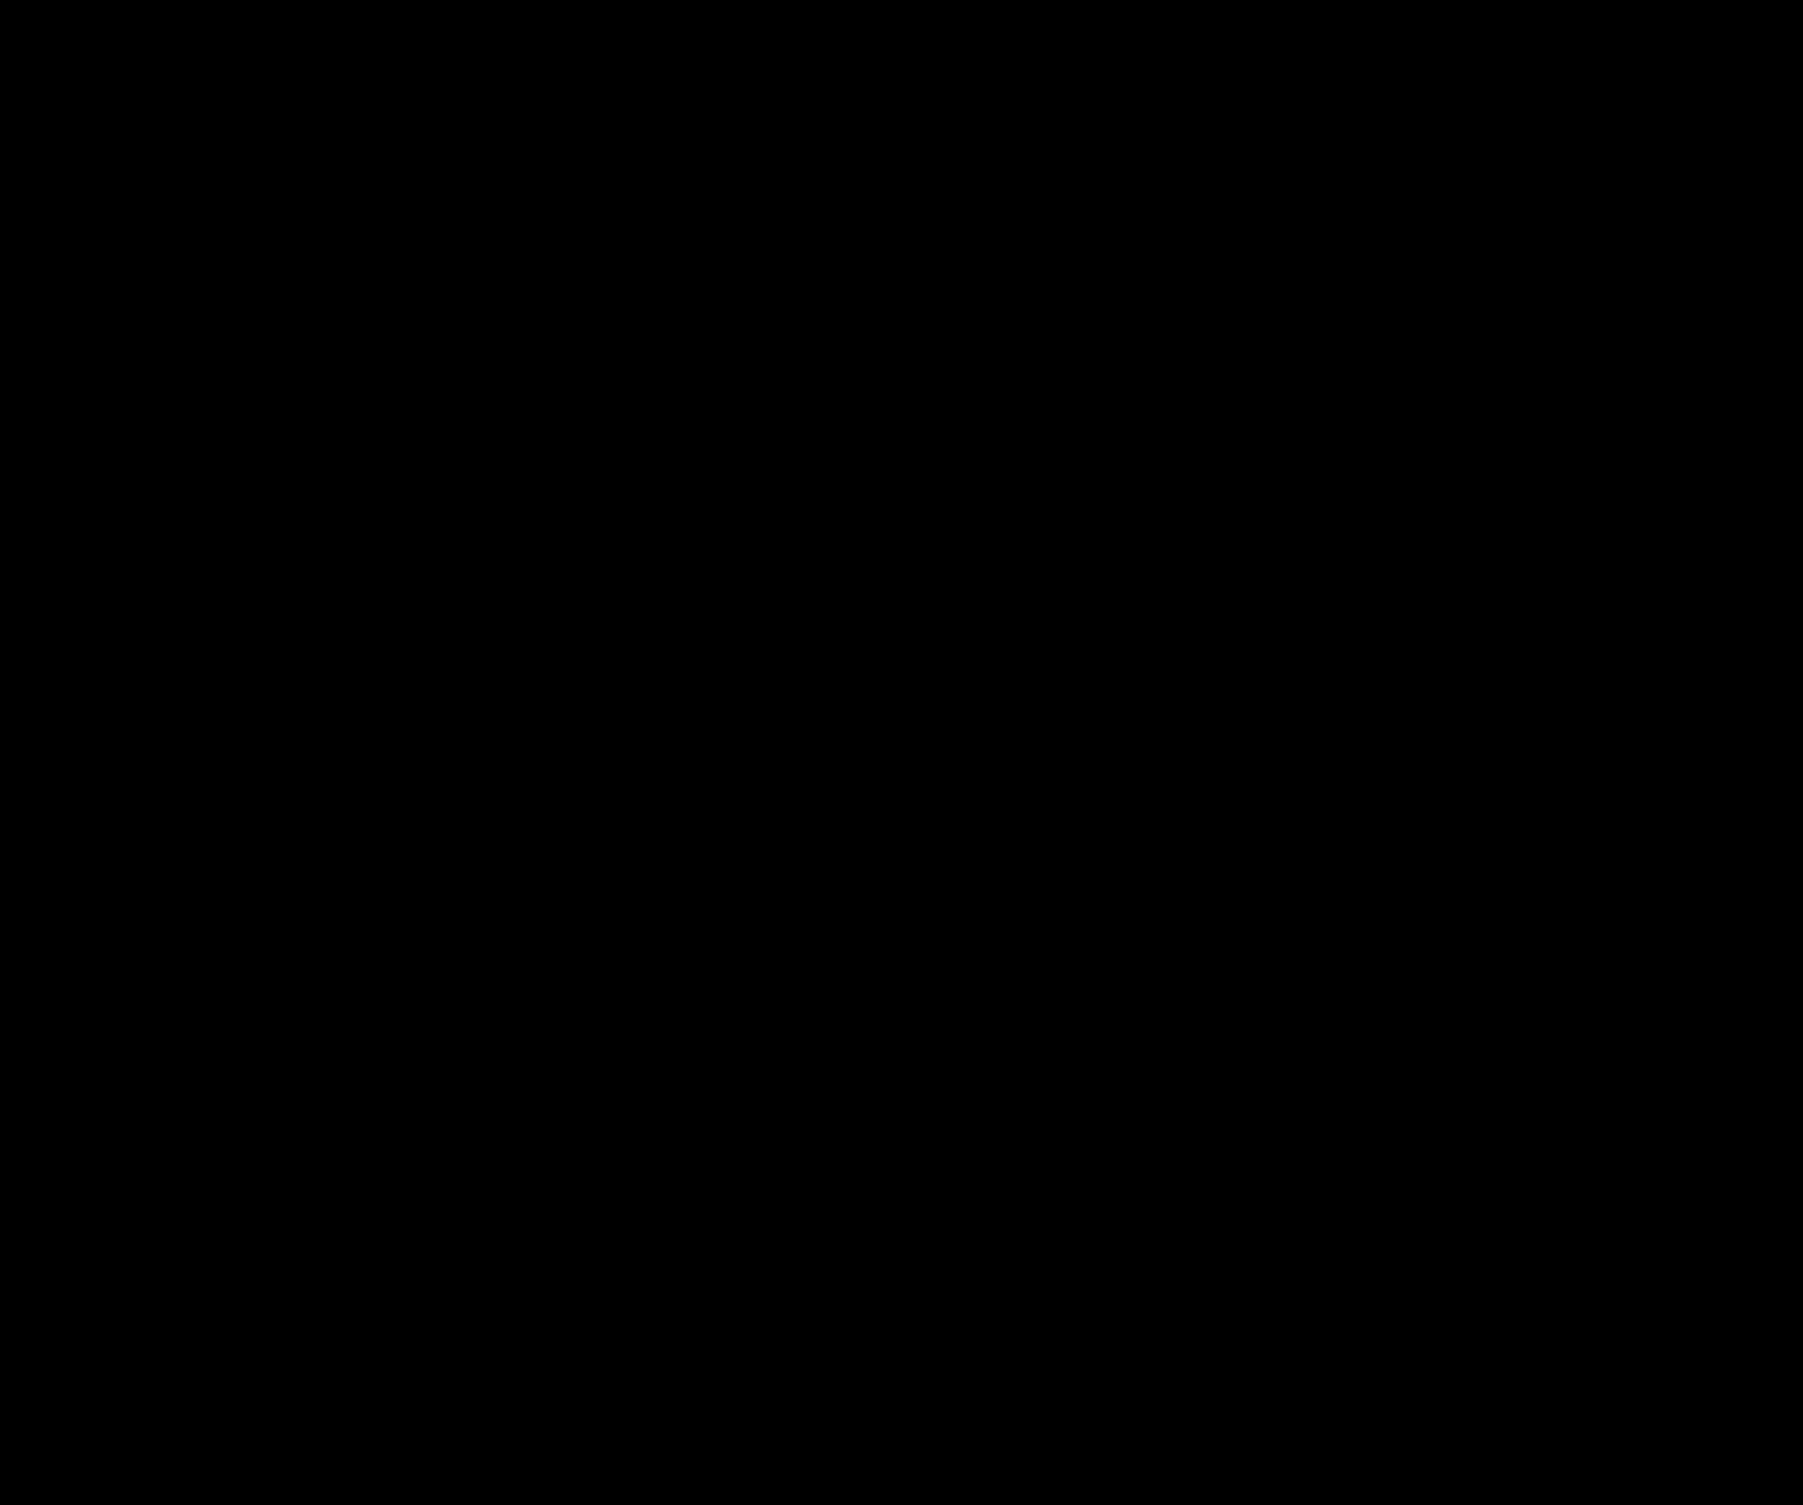 Sudan Black B, C.I. 26150, Certified